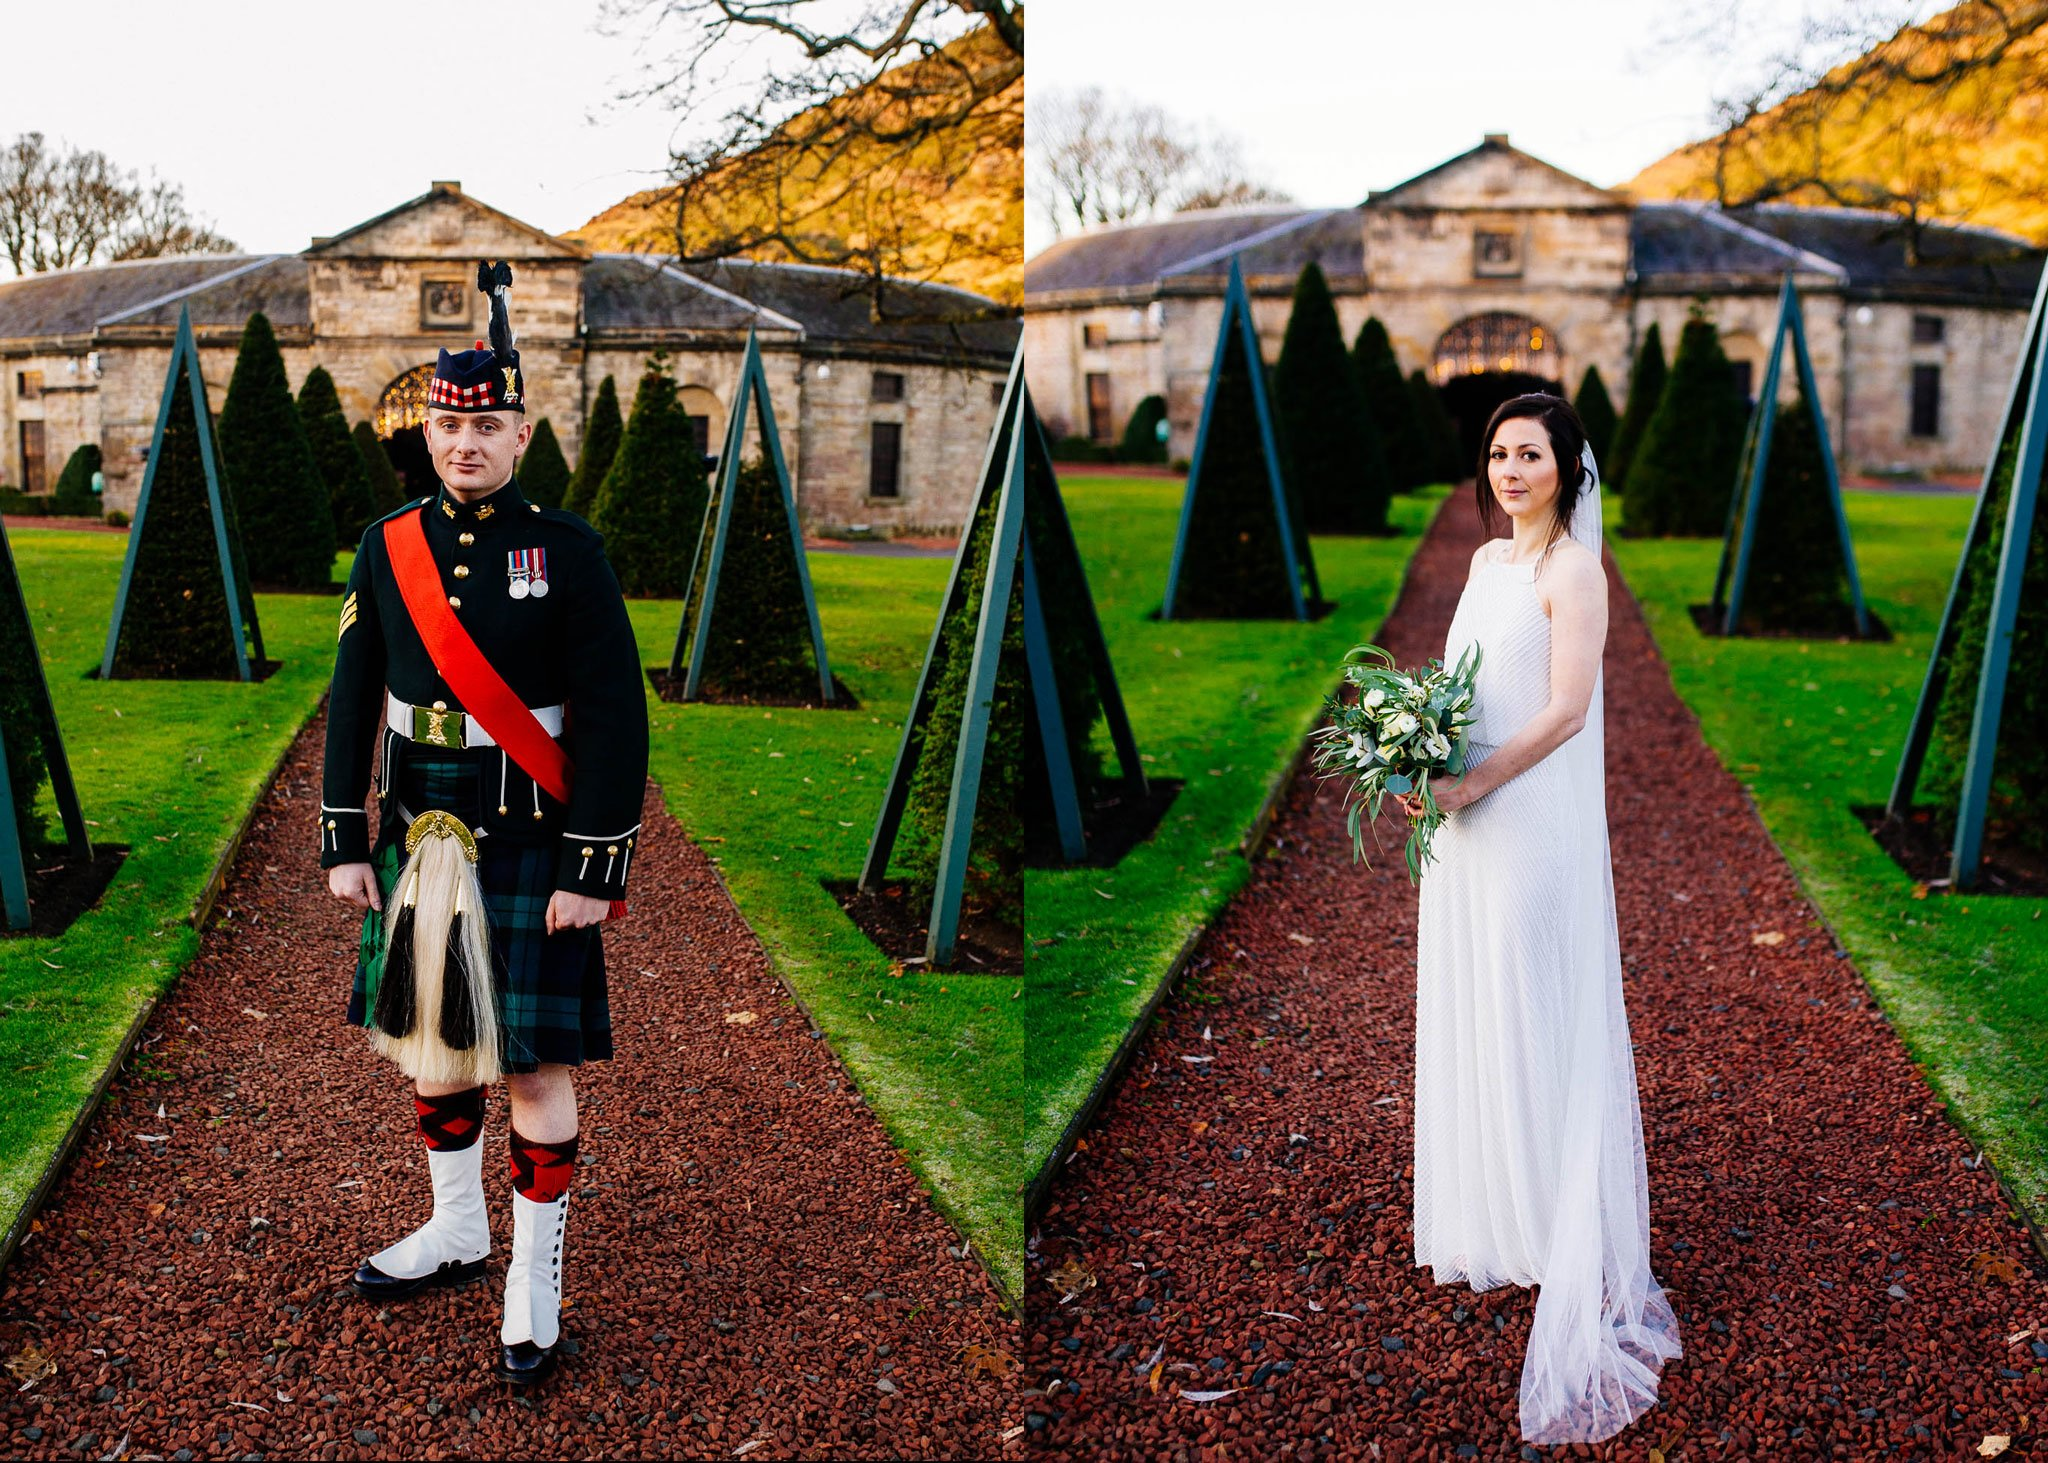 Pan i Pani Młoda w dniu ślubu